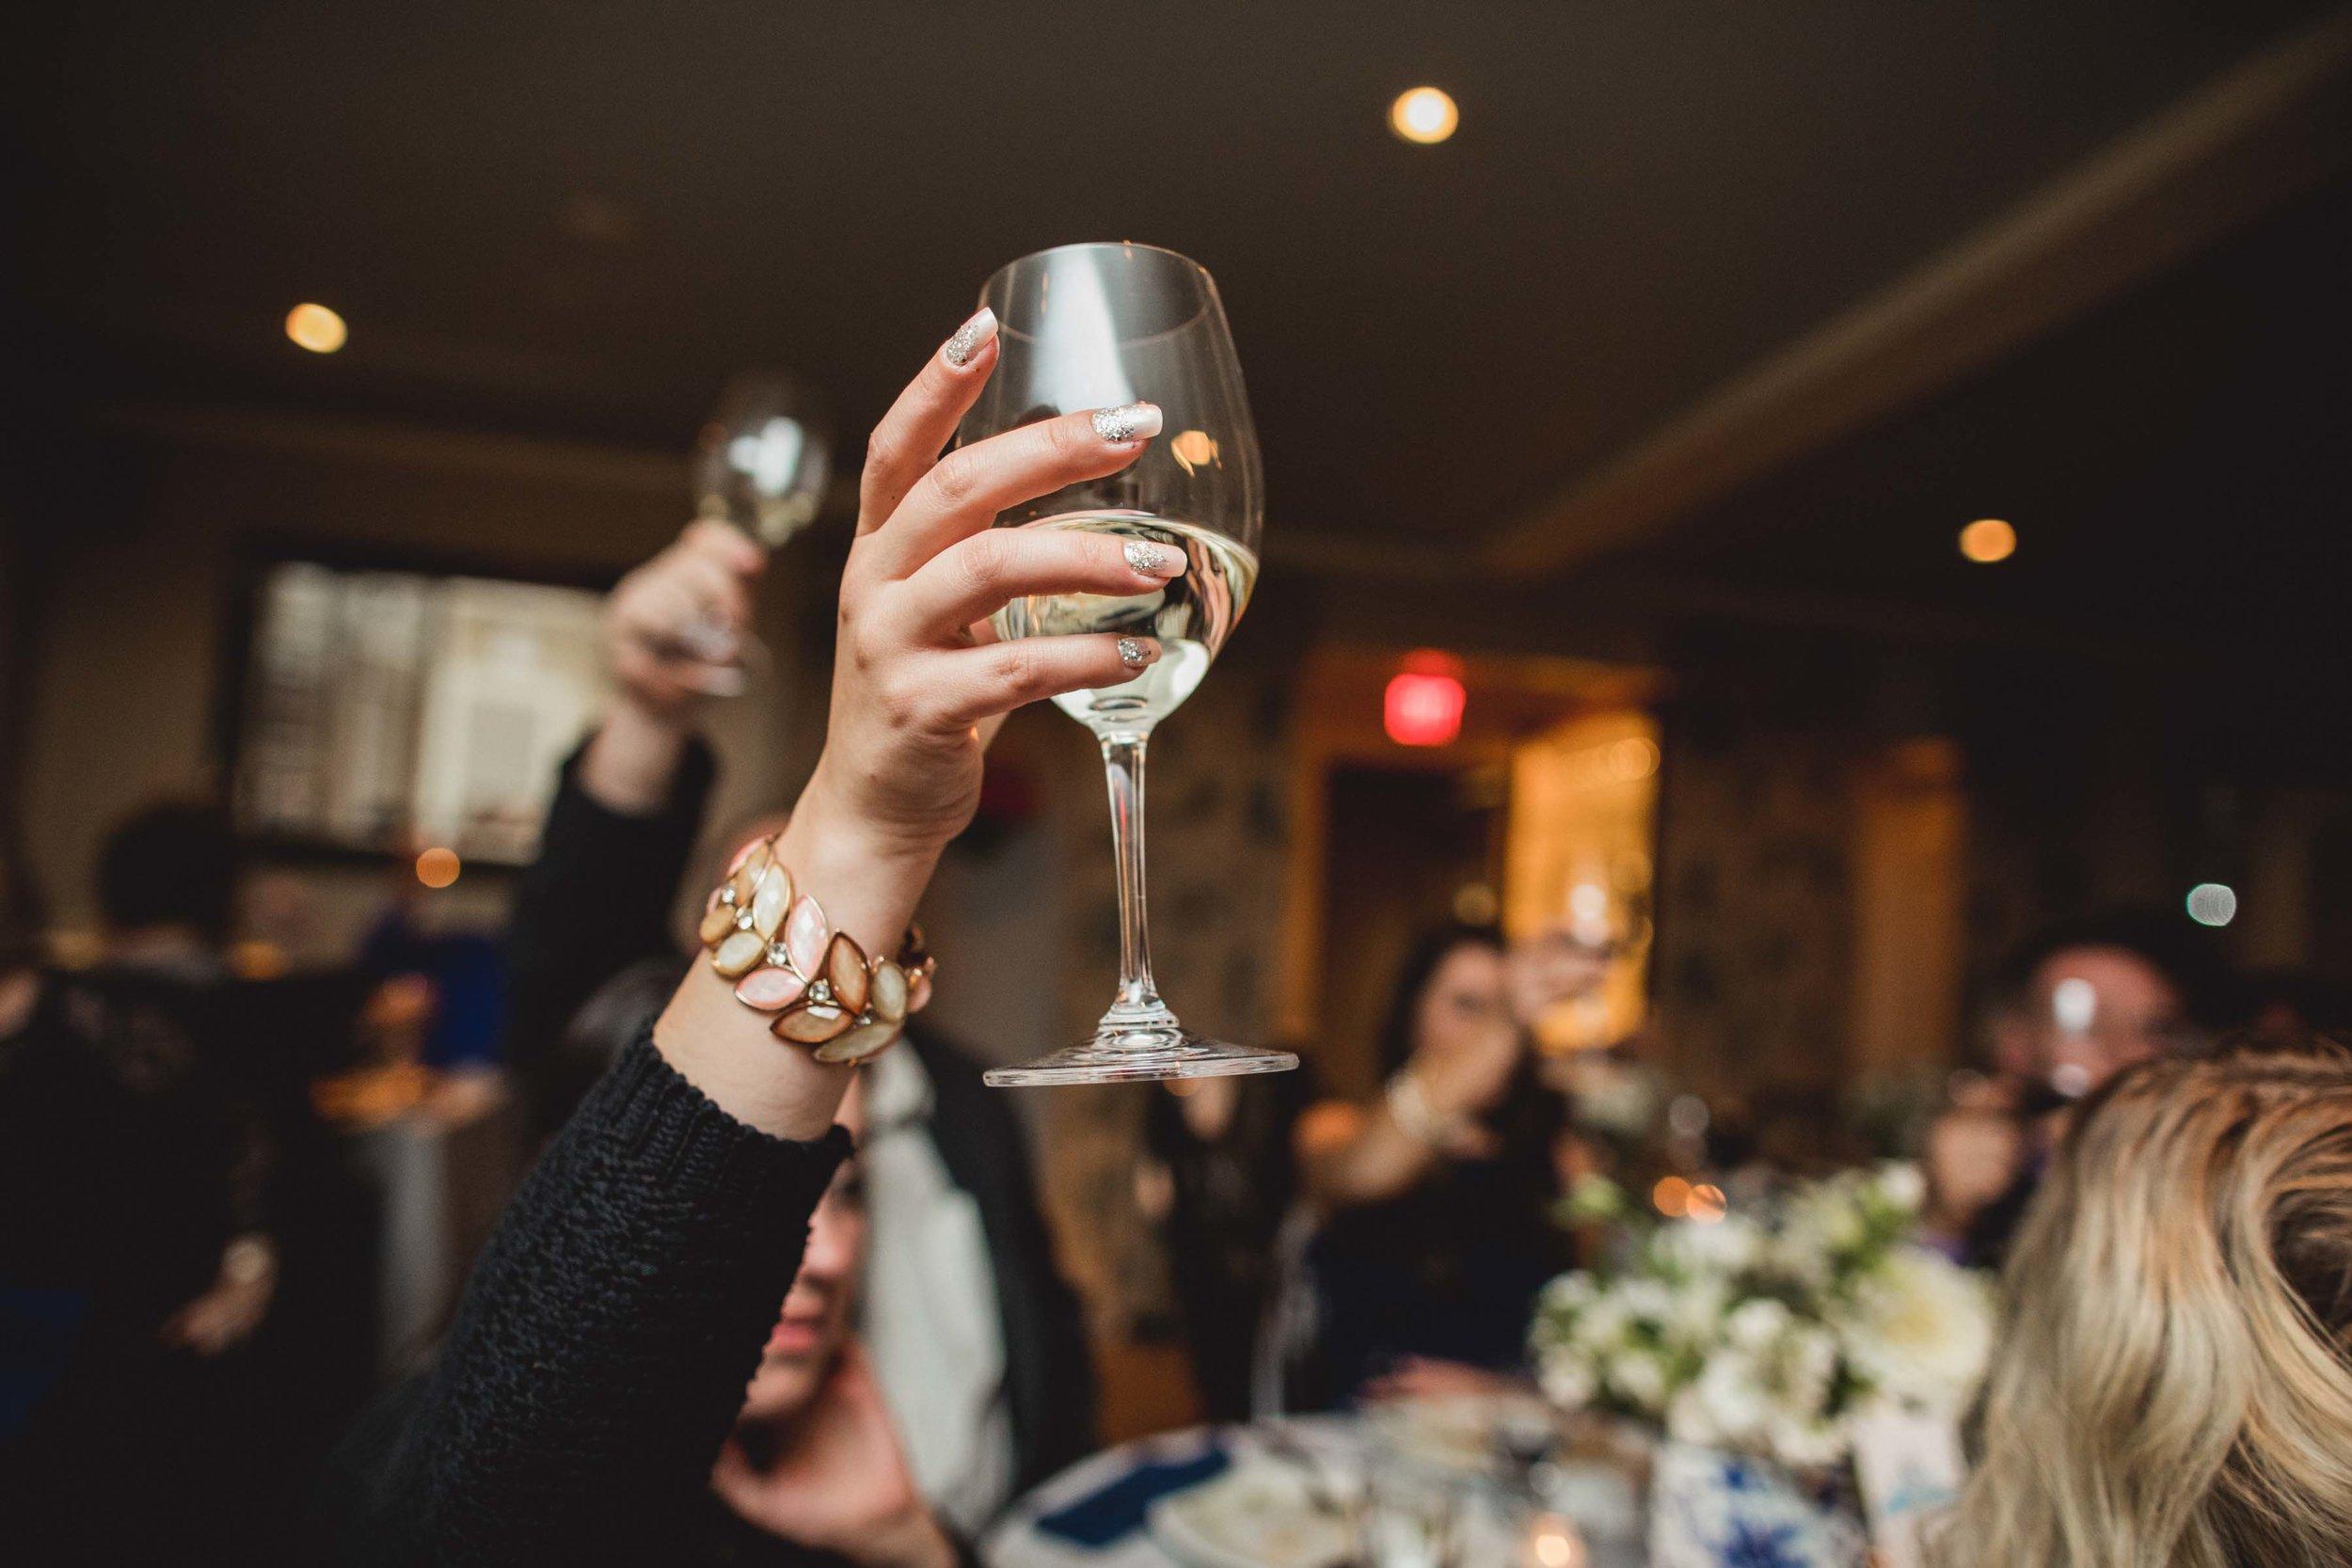 Marthas-vineyard-wedding-55.jpg